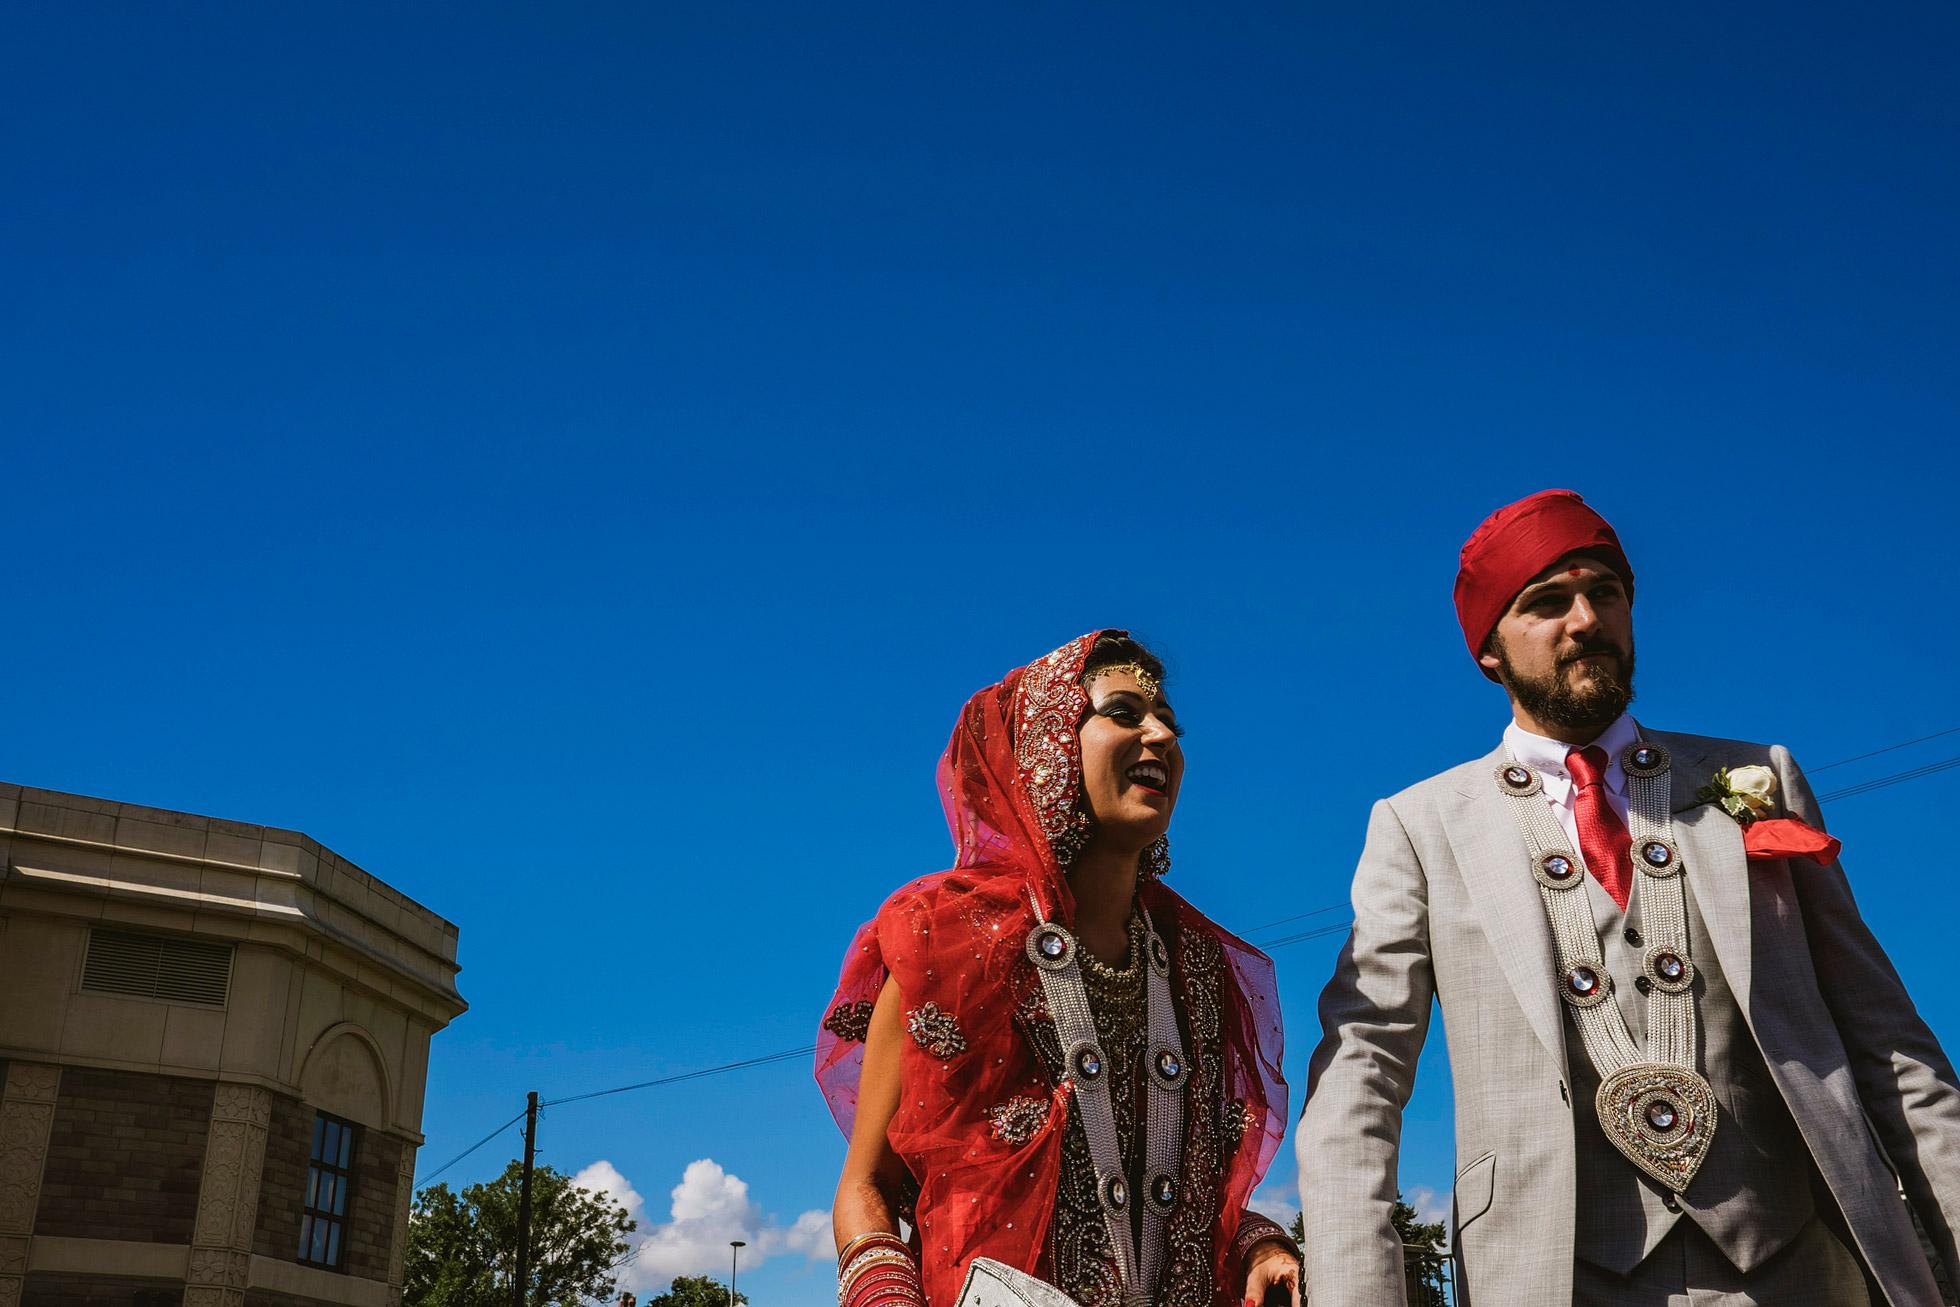 Emotional Indian Wedding Ceremony